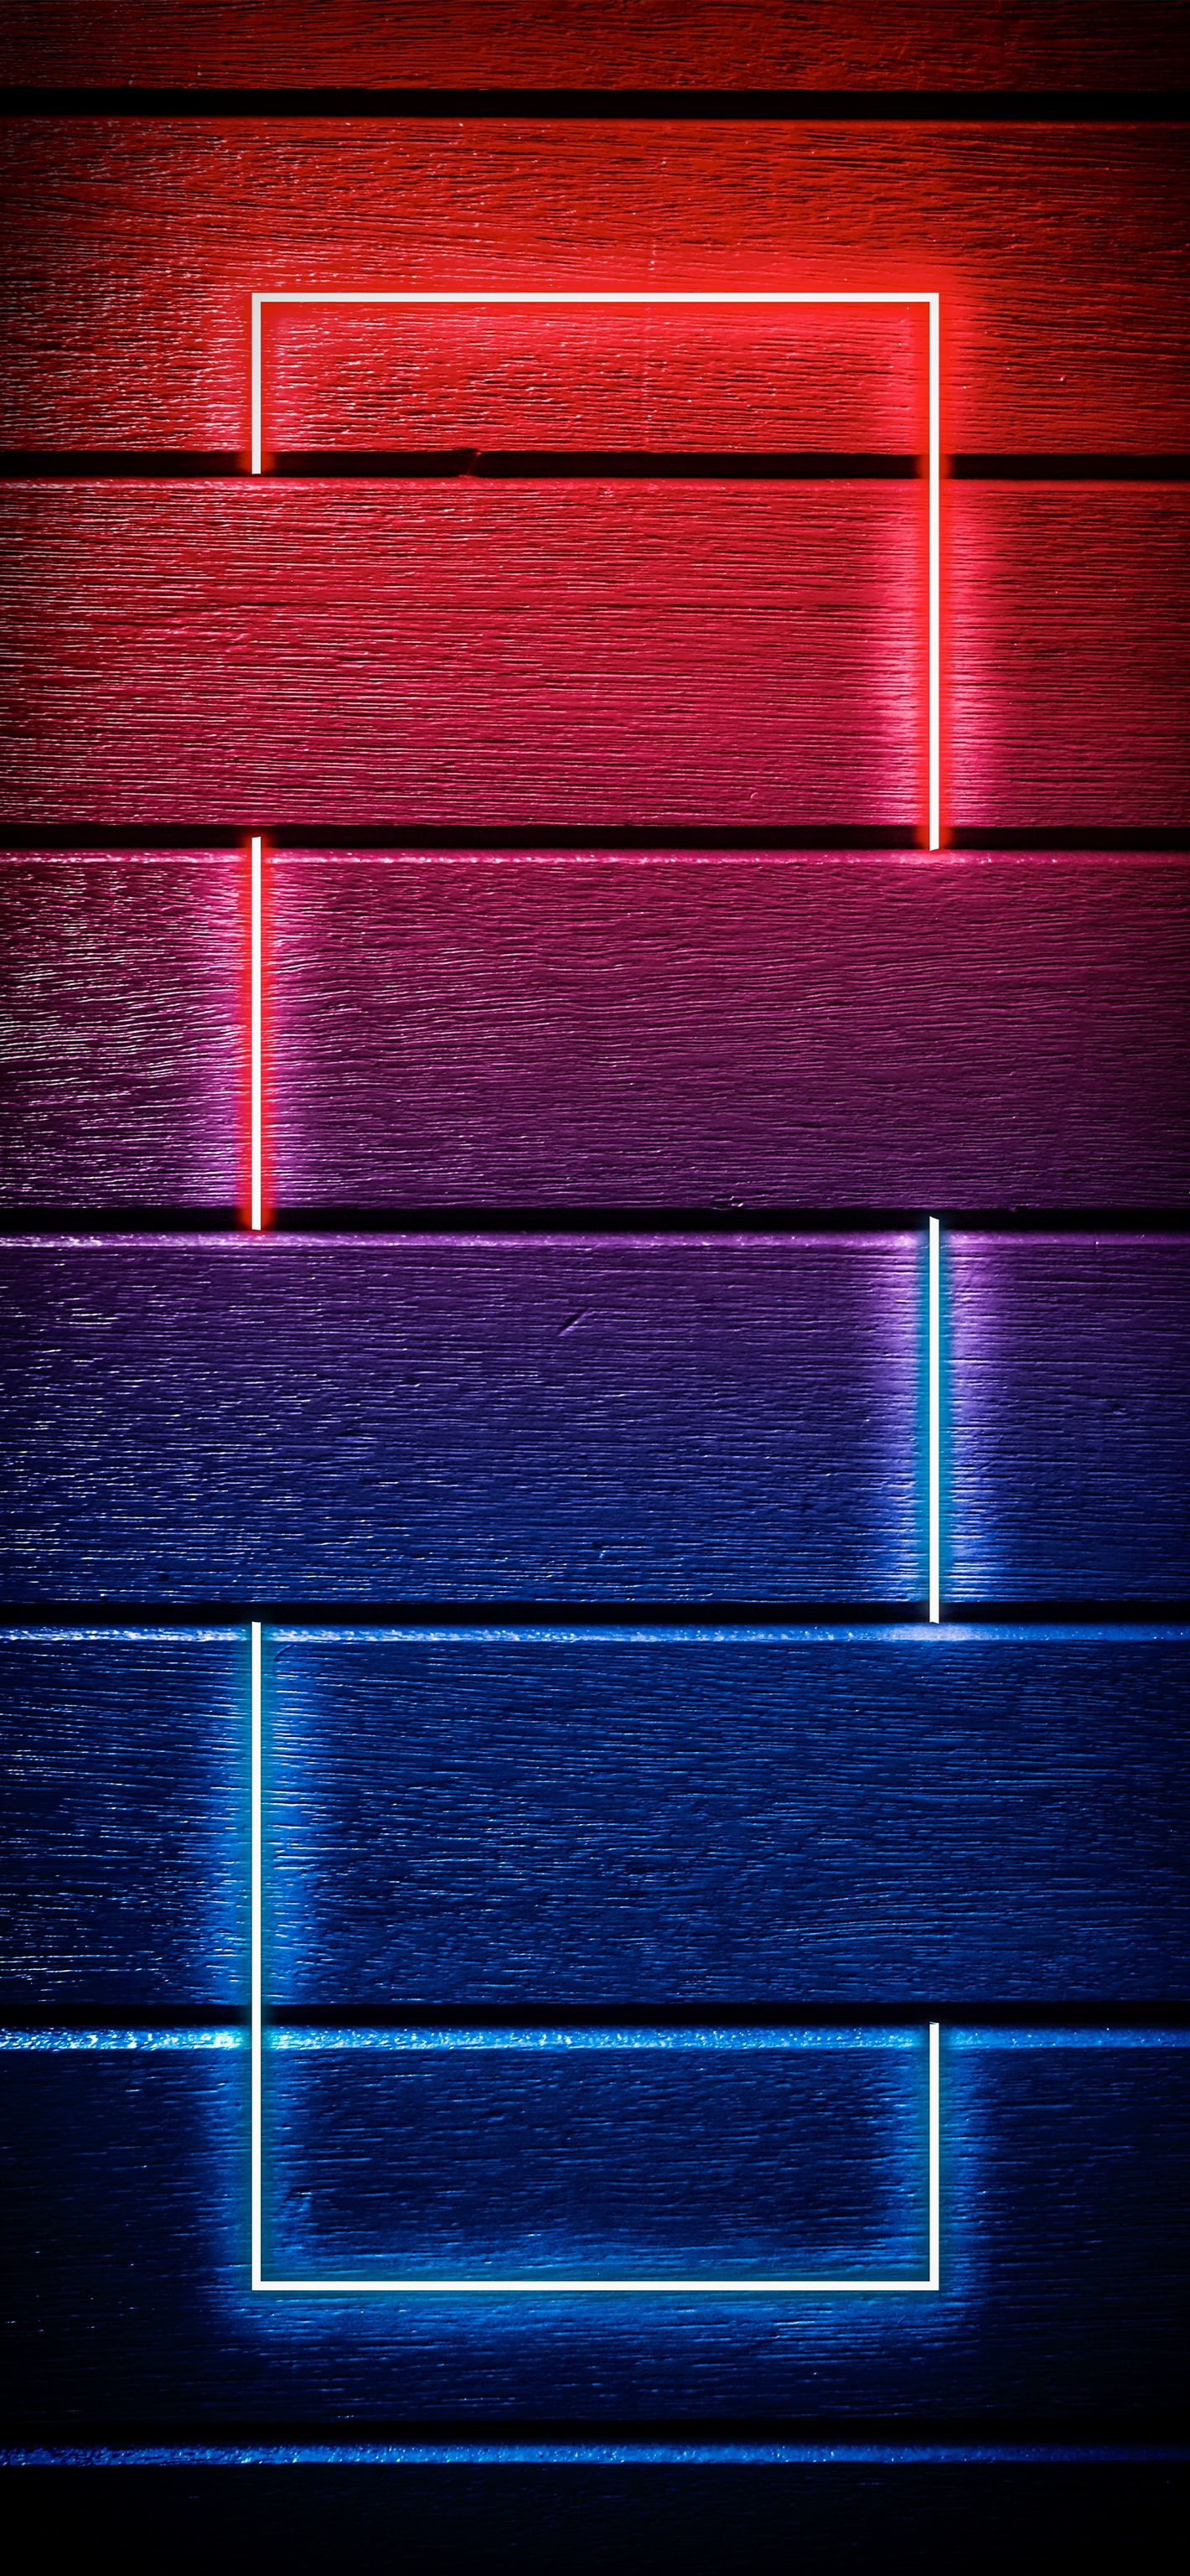 Wall Neon In 2021 Oneplus Wallpapers Neon Wallpaper Iphone Background Wallpaper